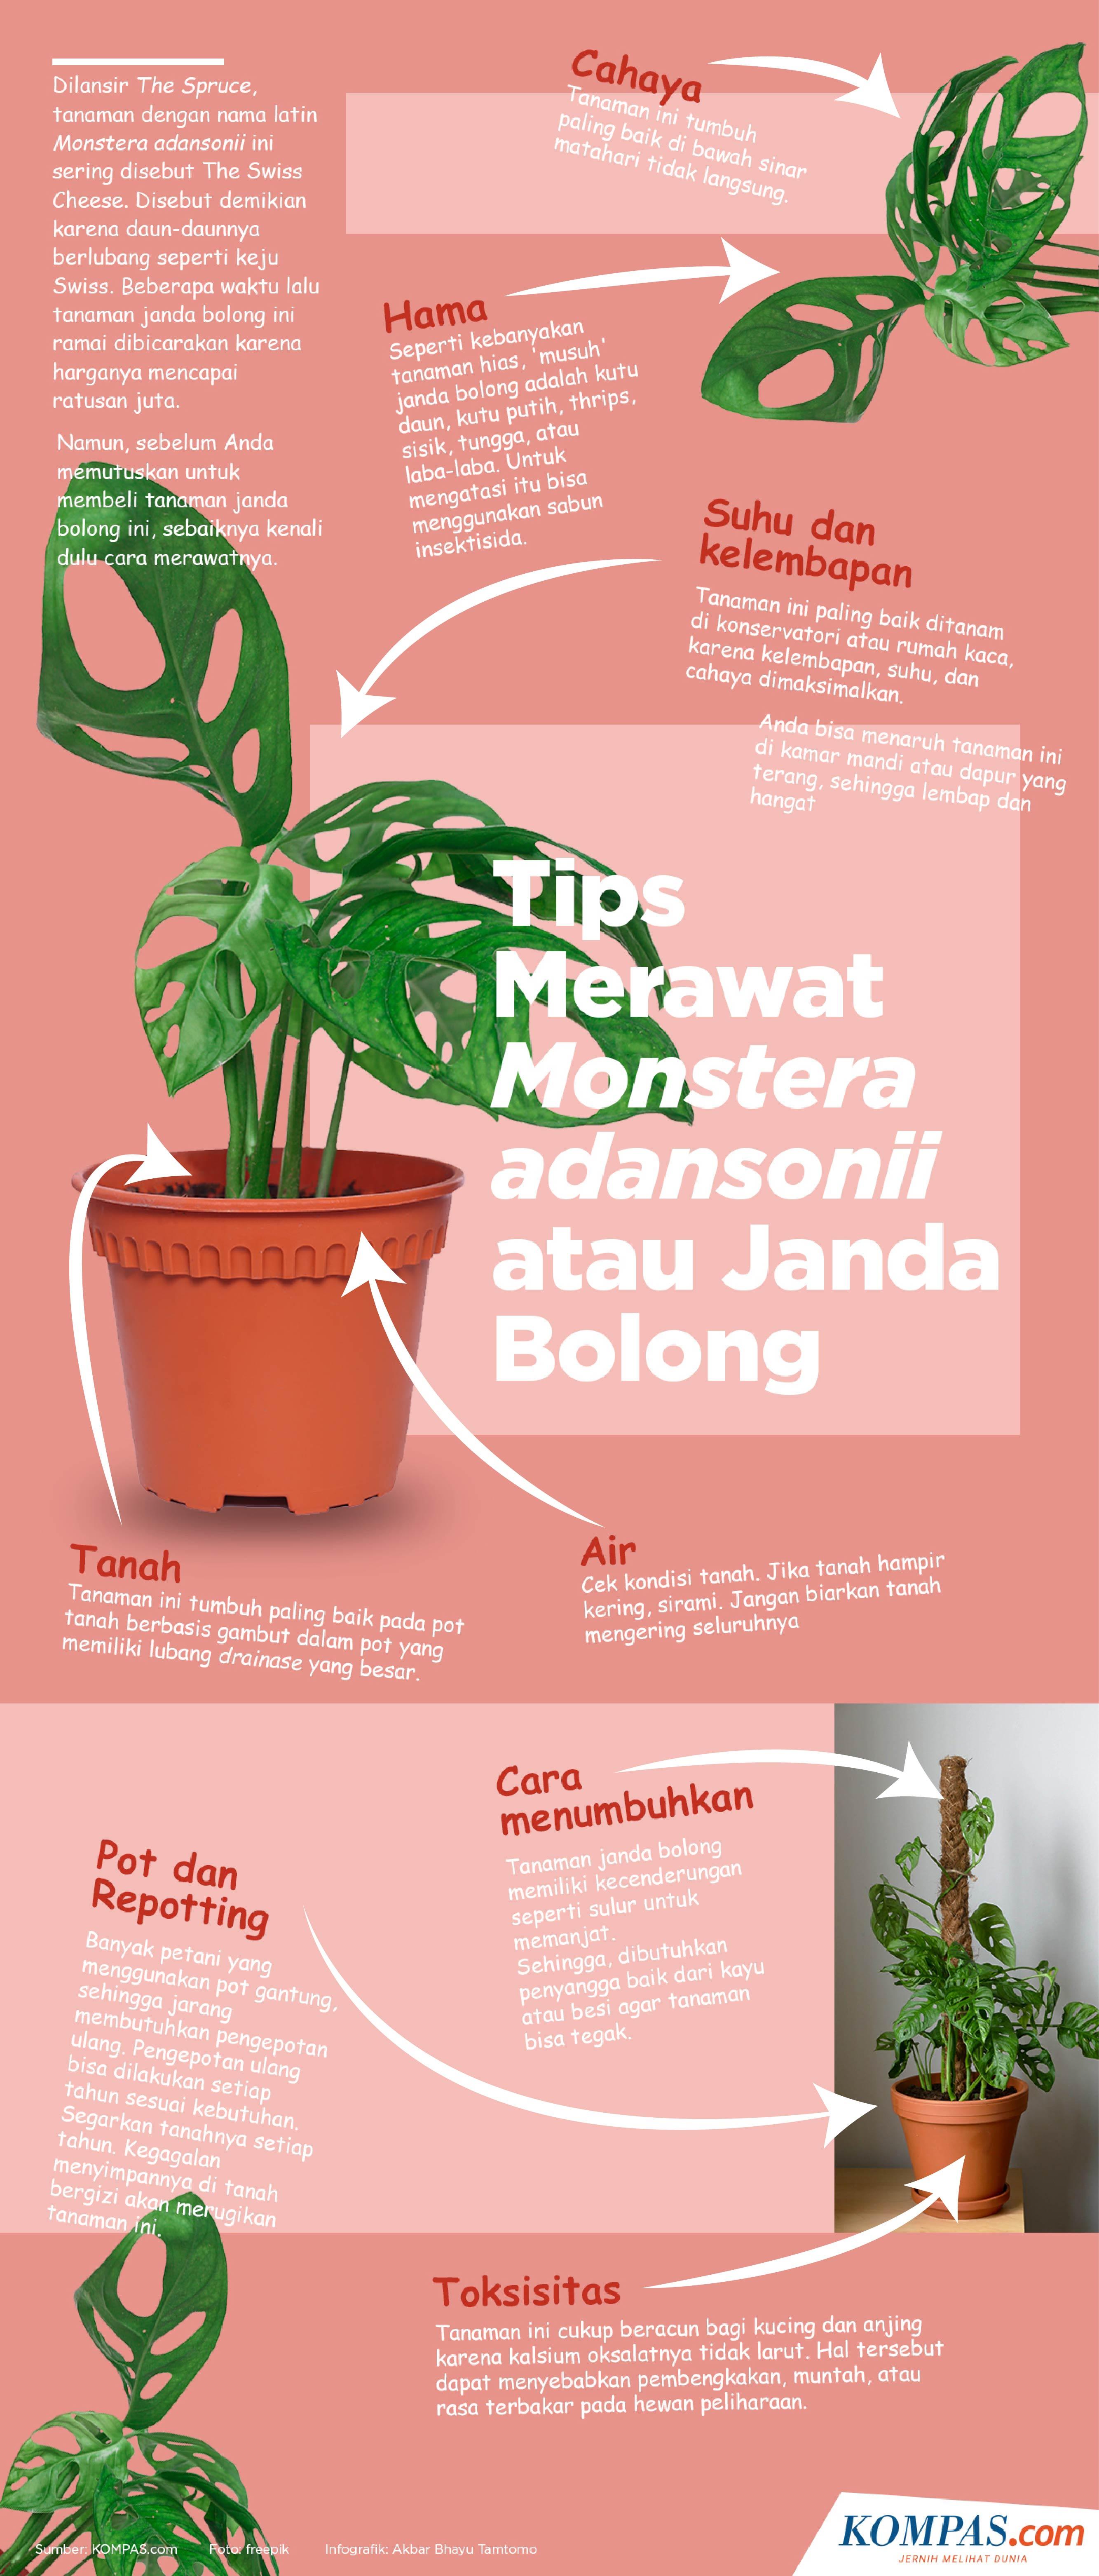 Infografik Tips Merawat Monstera Adansonii Atau Janda Bolong